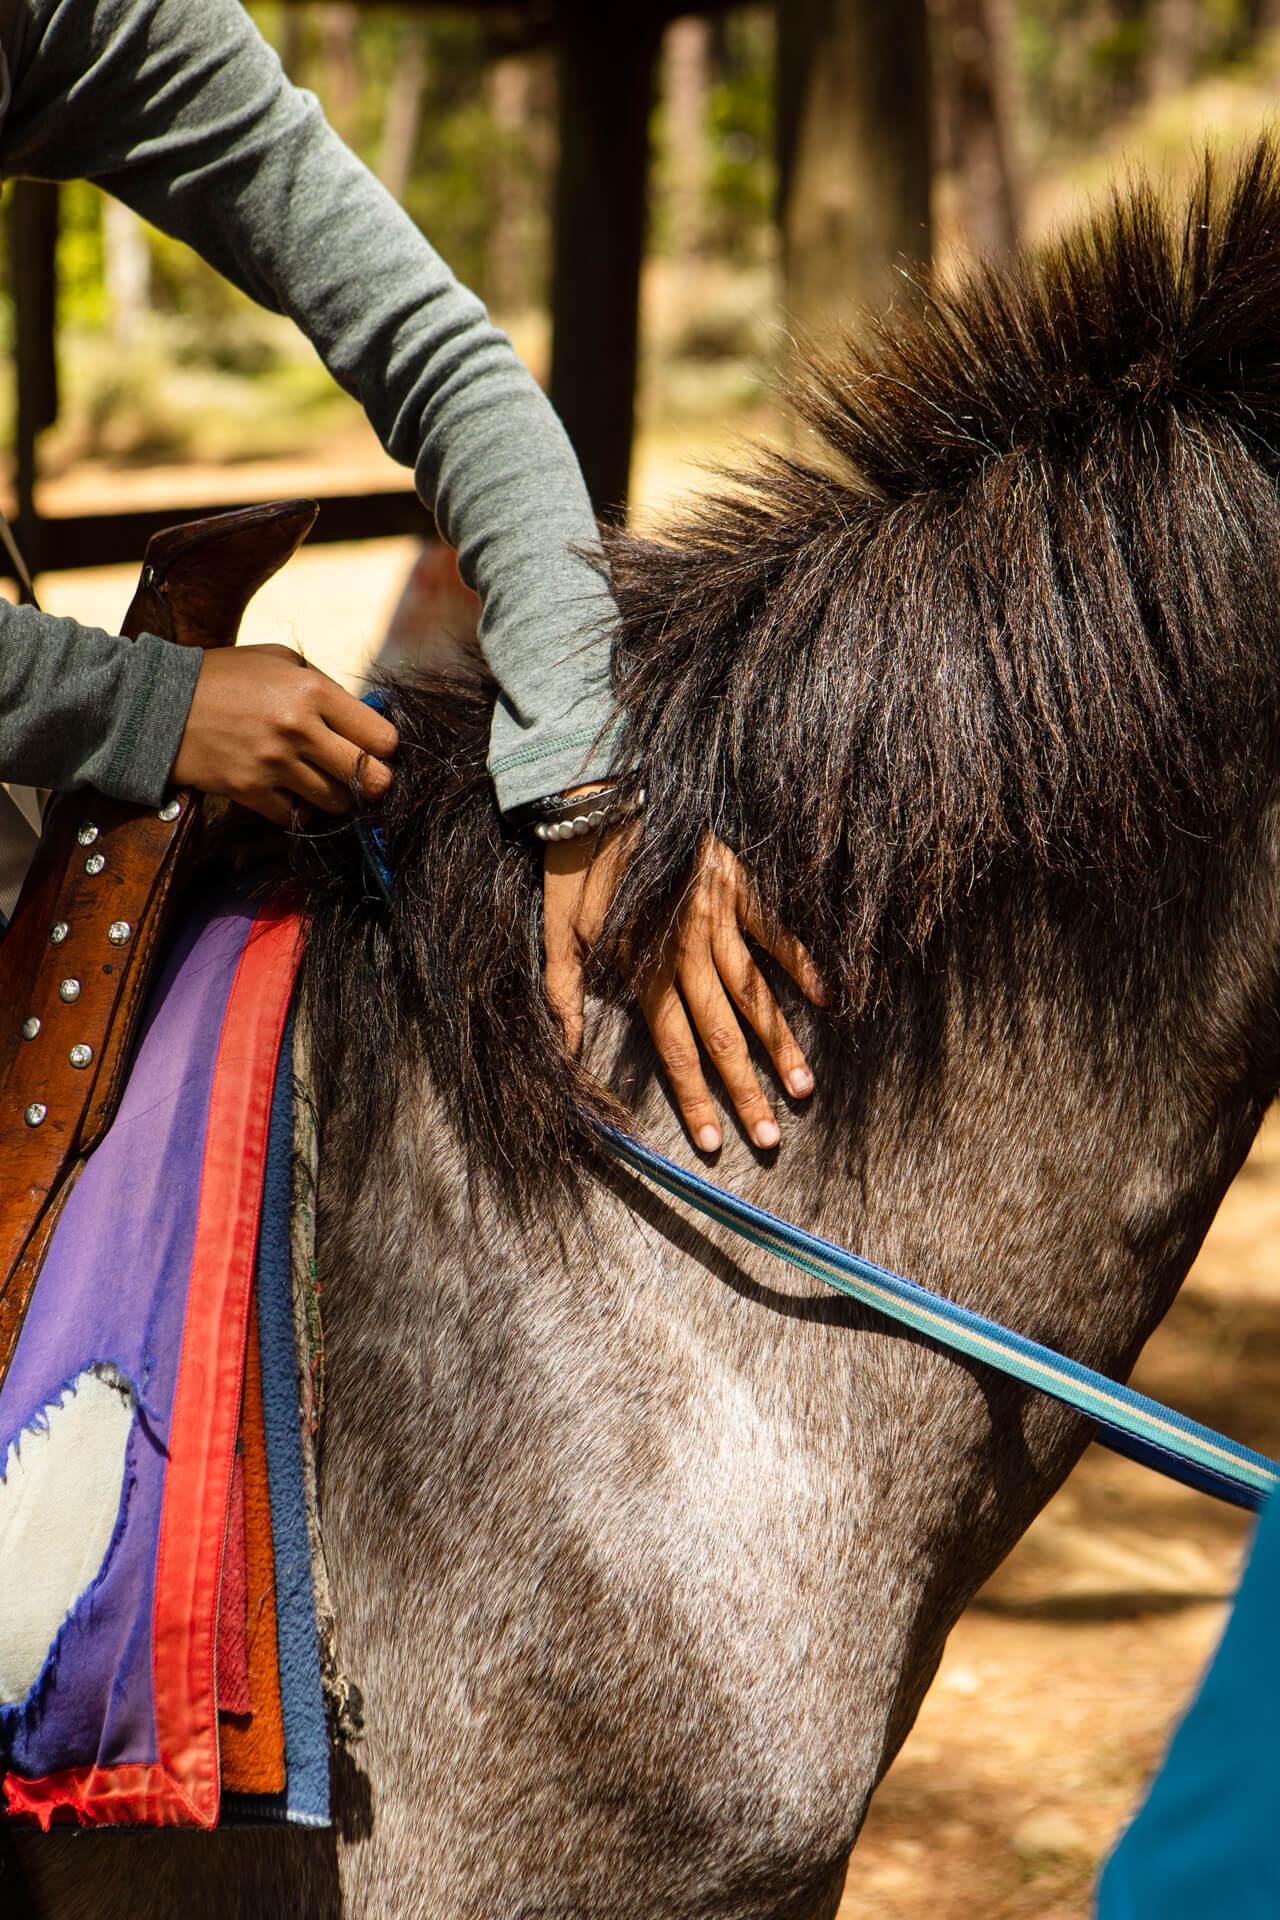 Solana Perez prepares to ride a horse named Raincloud